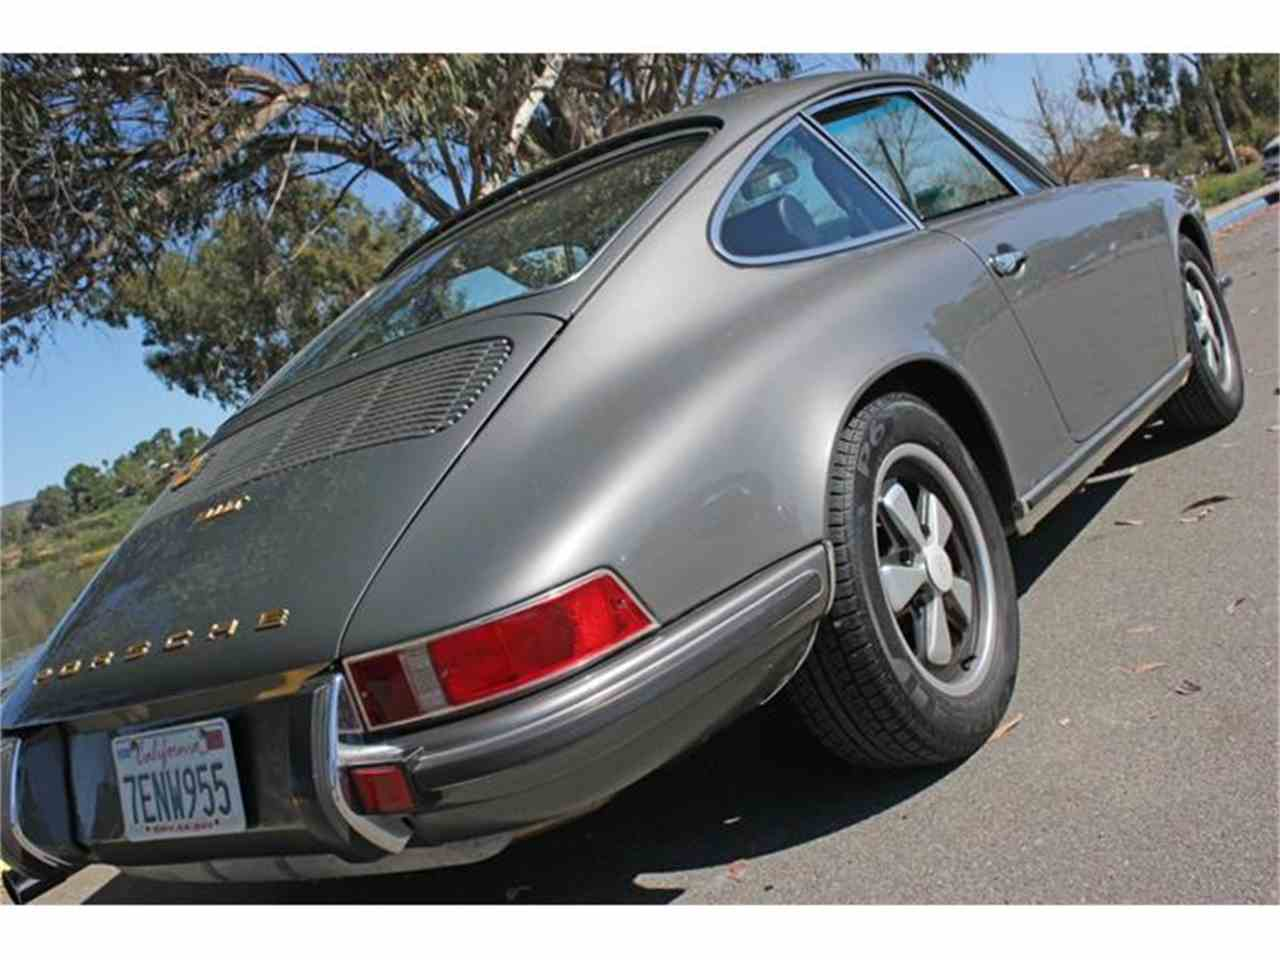 Car Insurance In Whittier California